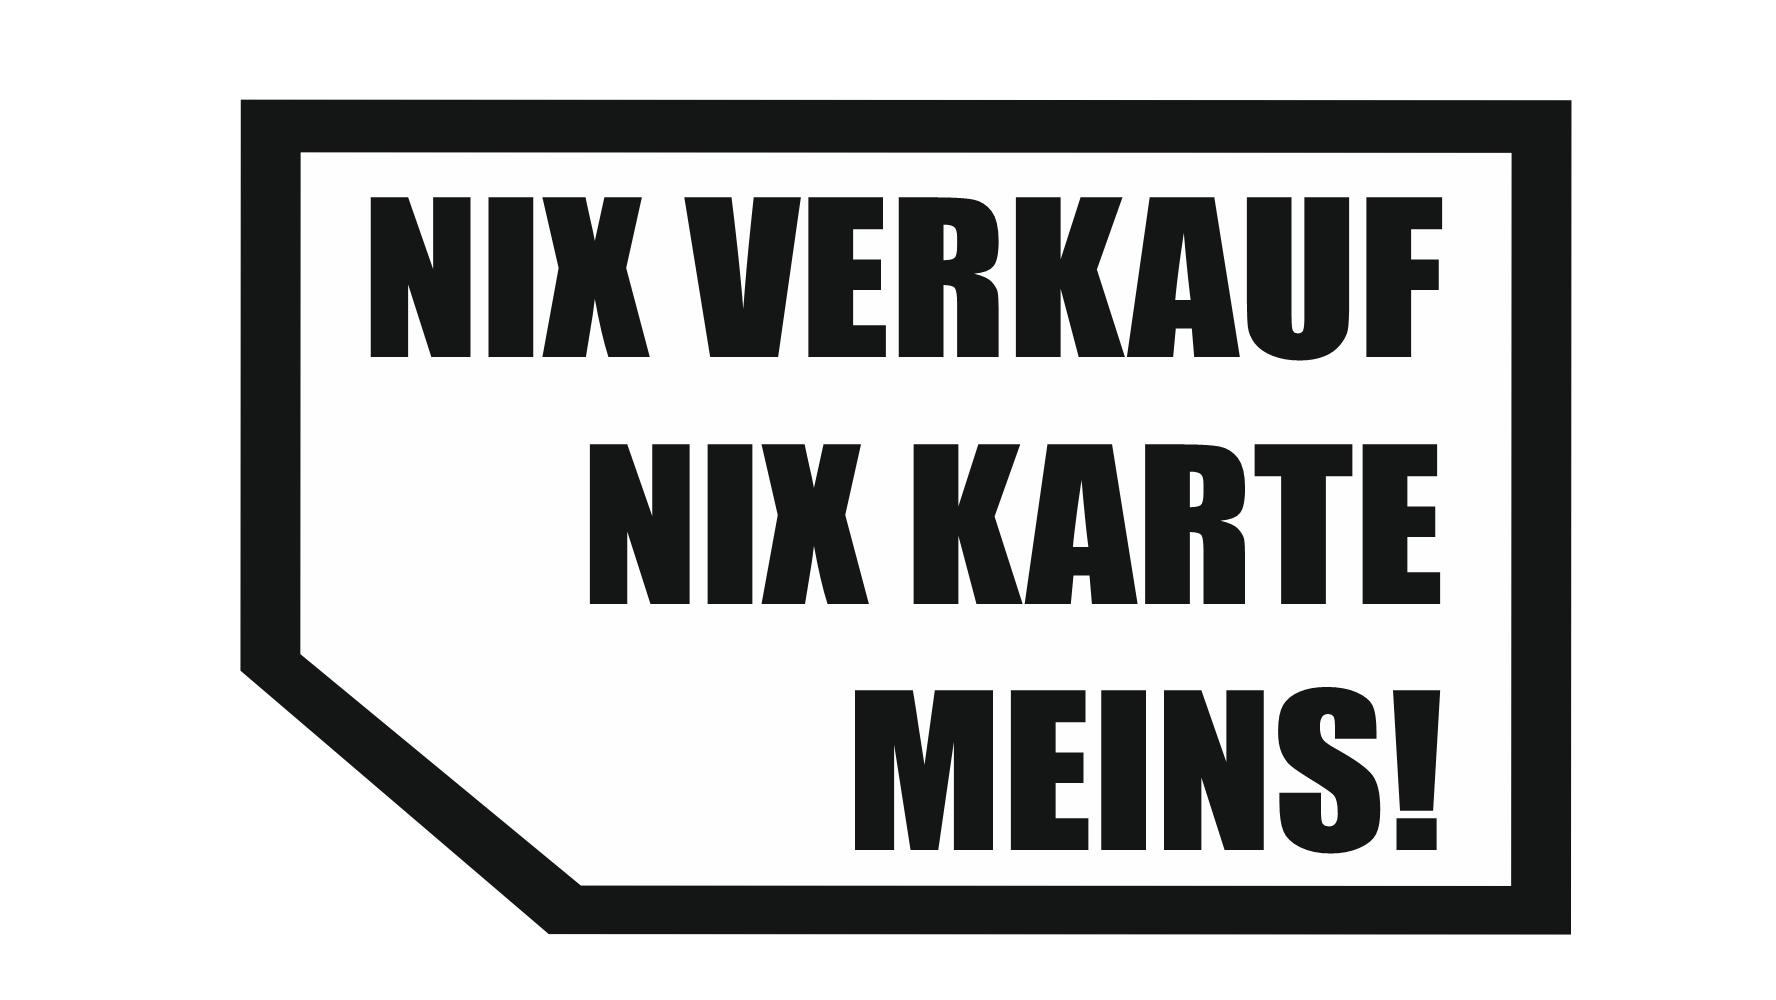 Theiss Druck Gratis Nix Verkauf Nix Karte Meins